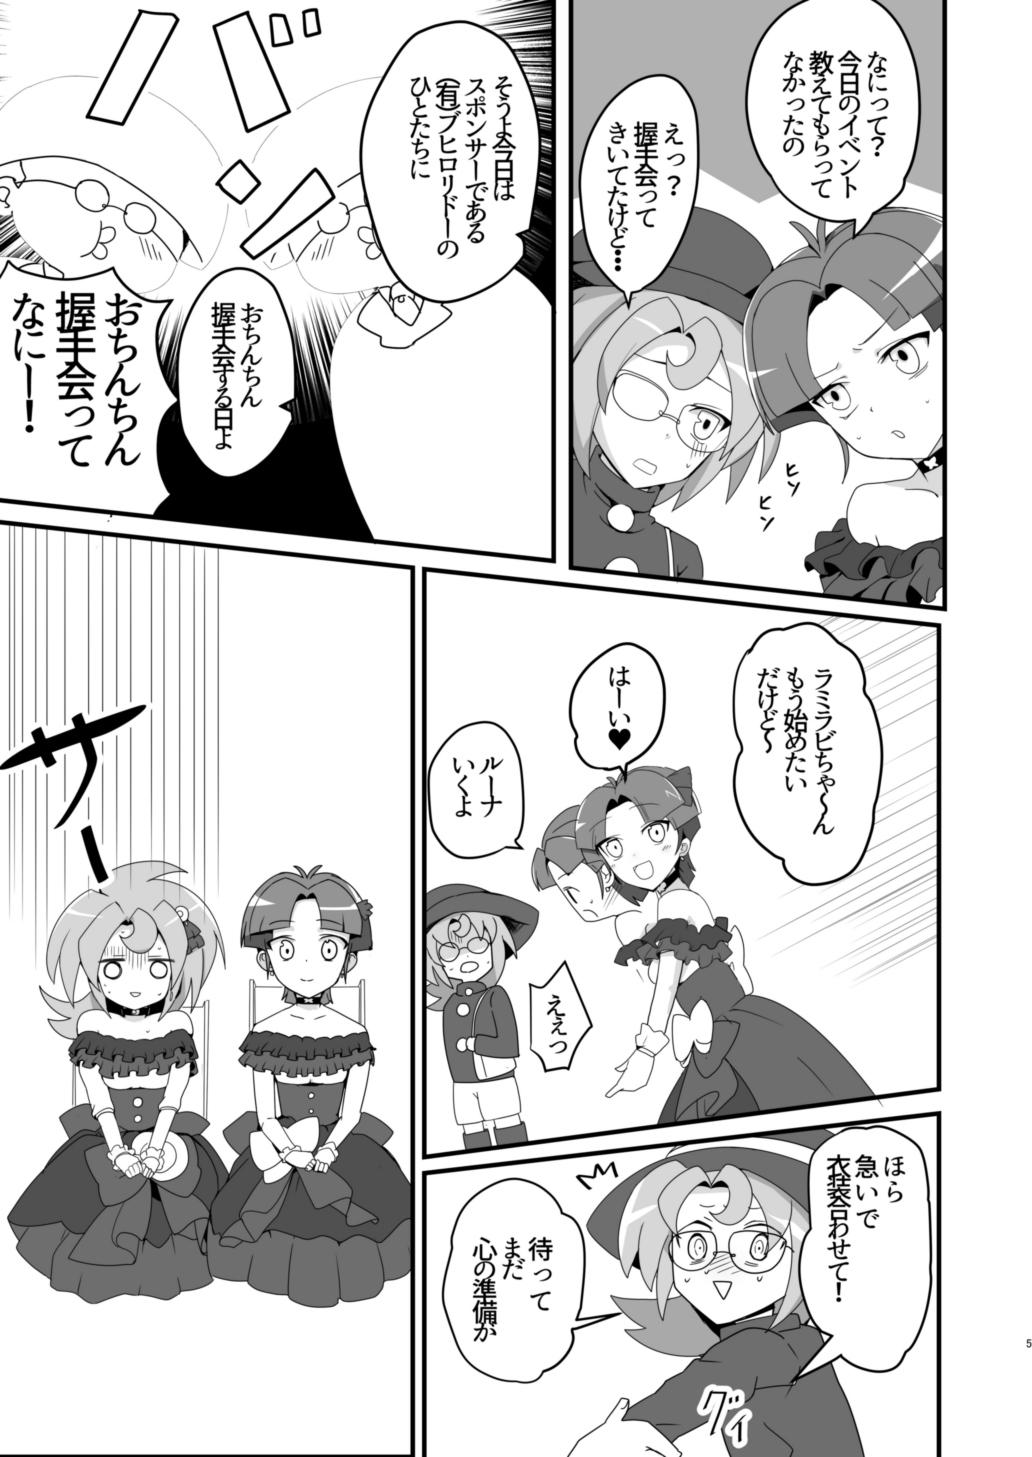 LunaAm O♂n♂n Akushuukai 3